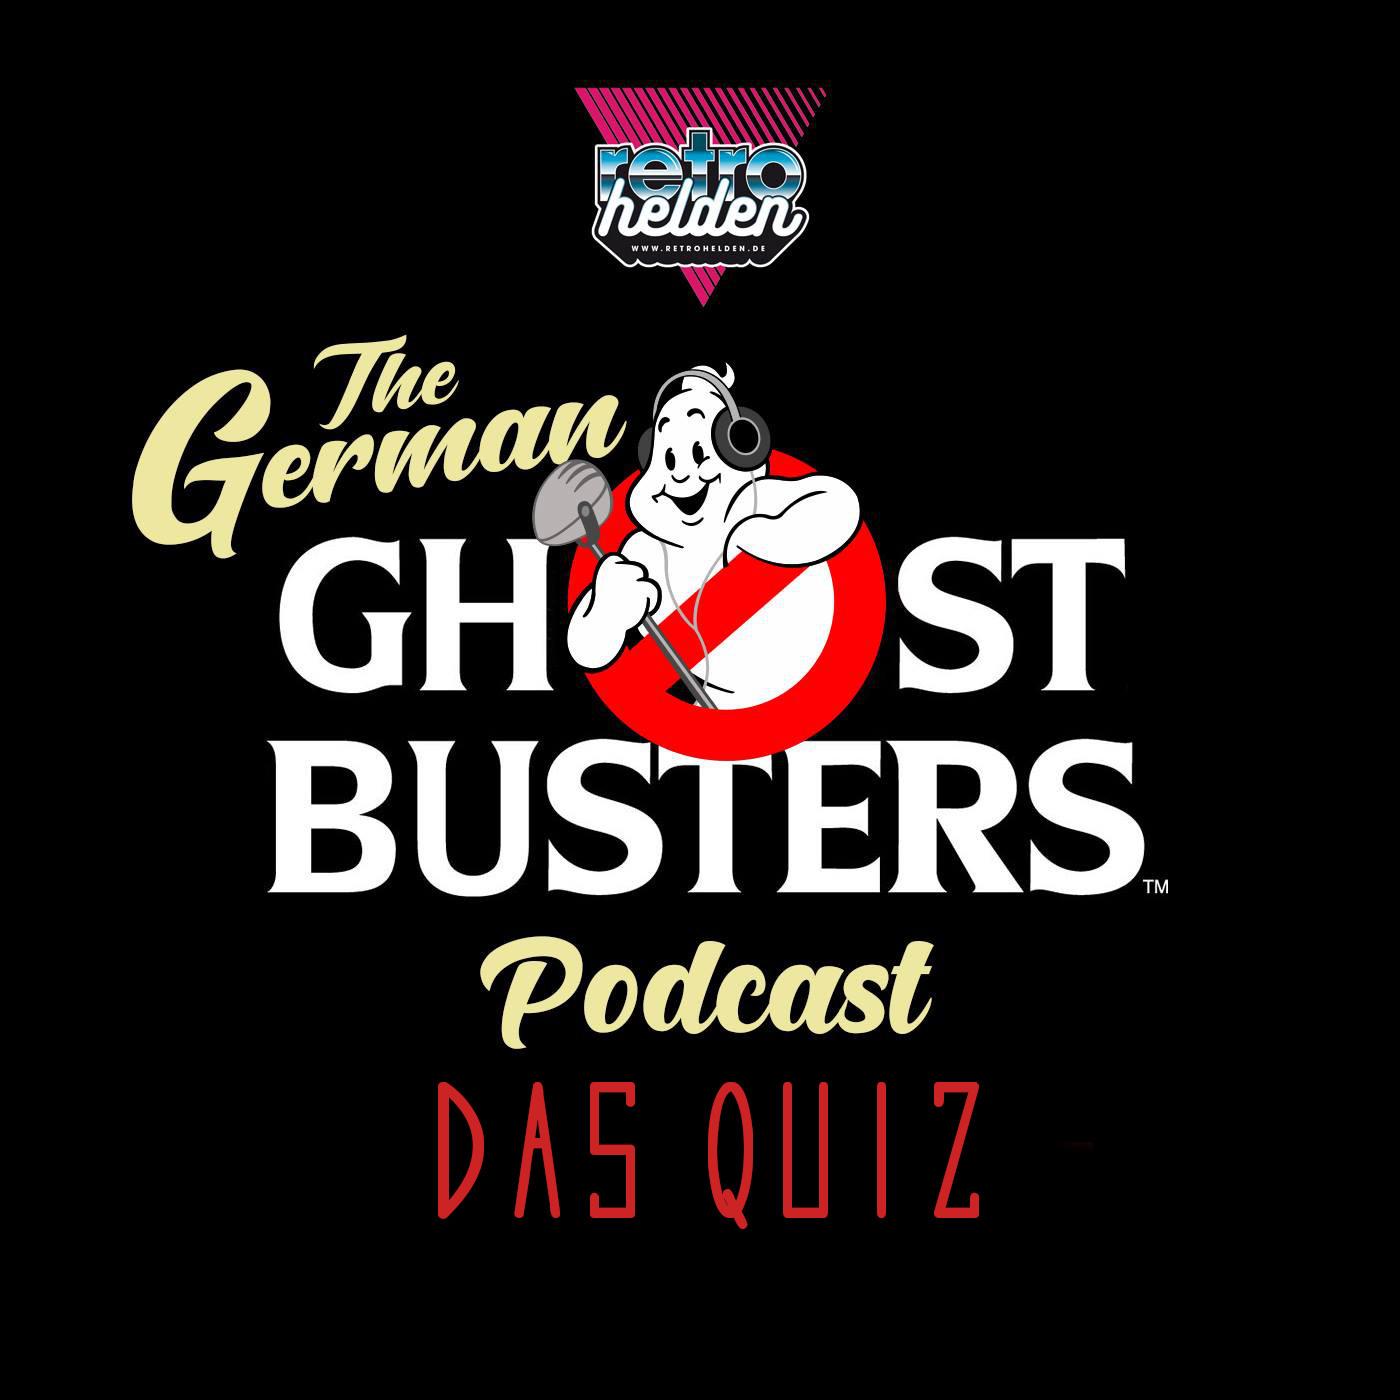 Folge 003 - Das Quiz